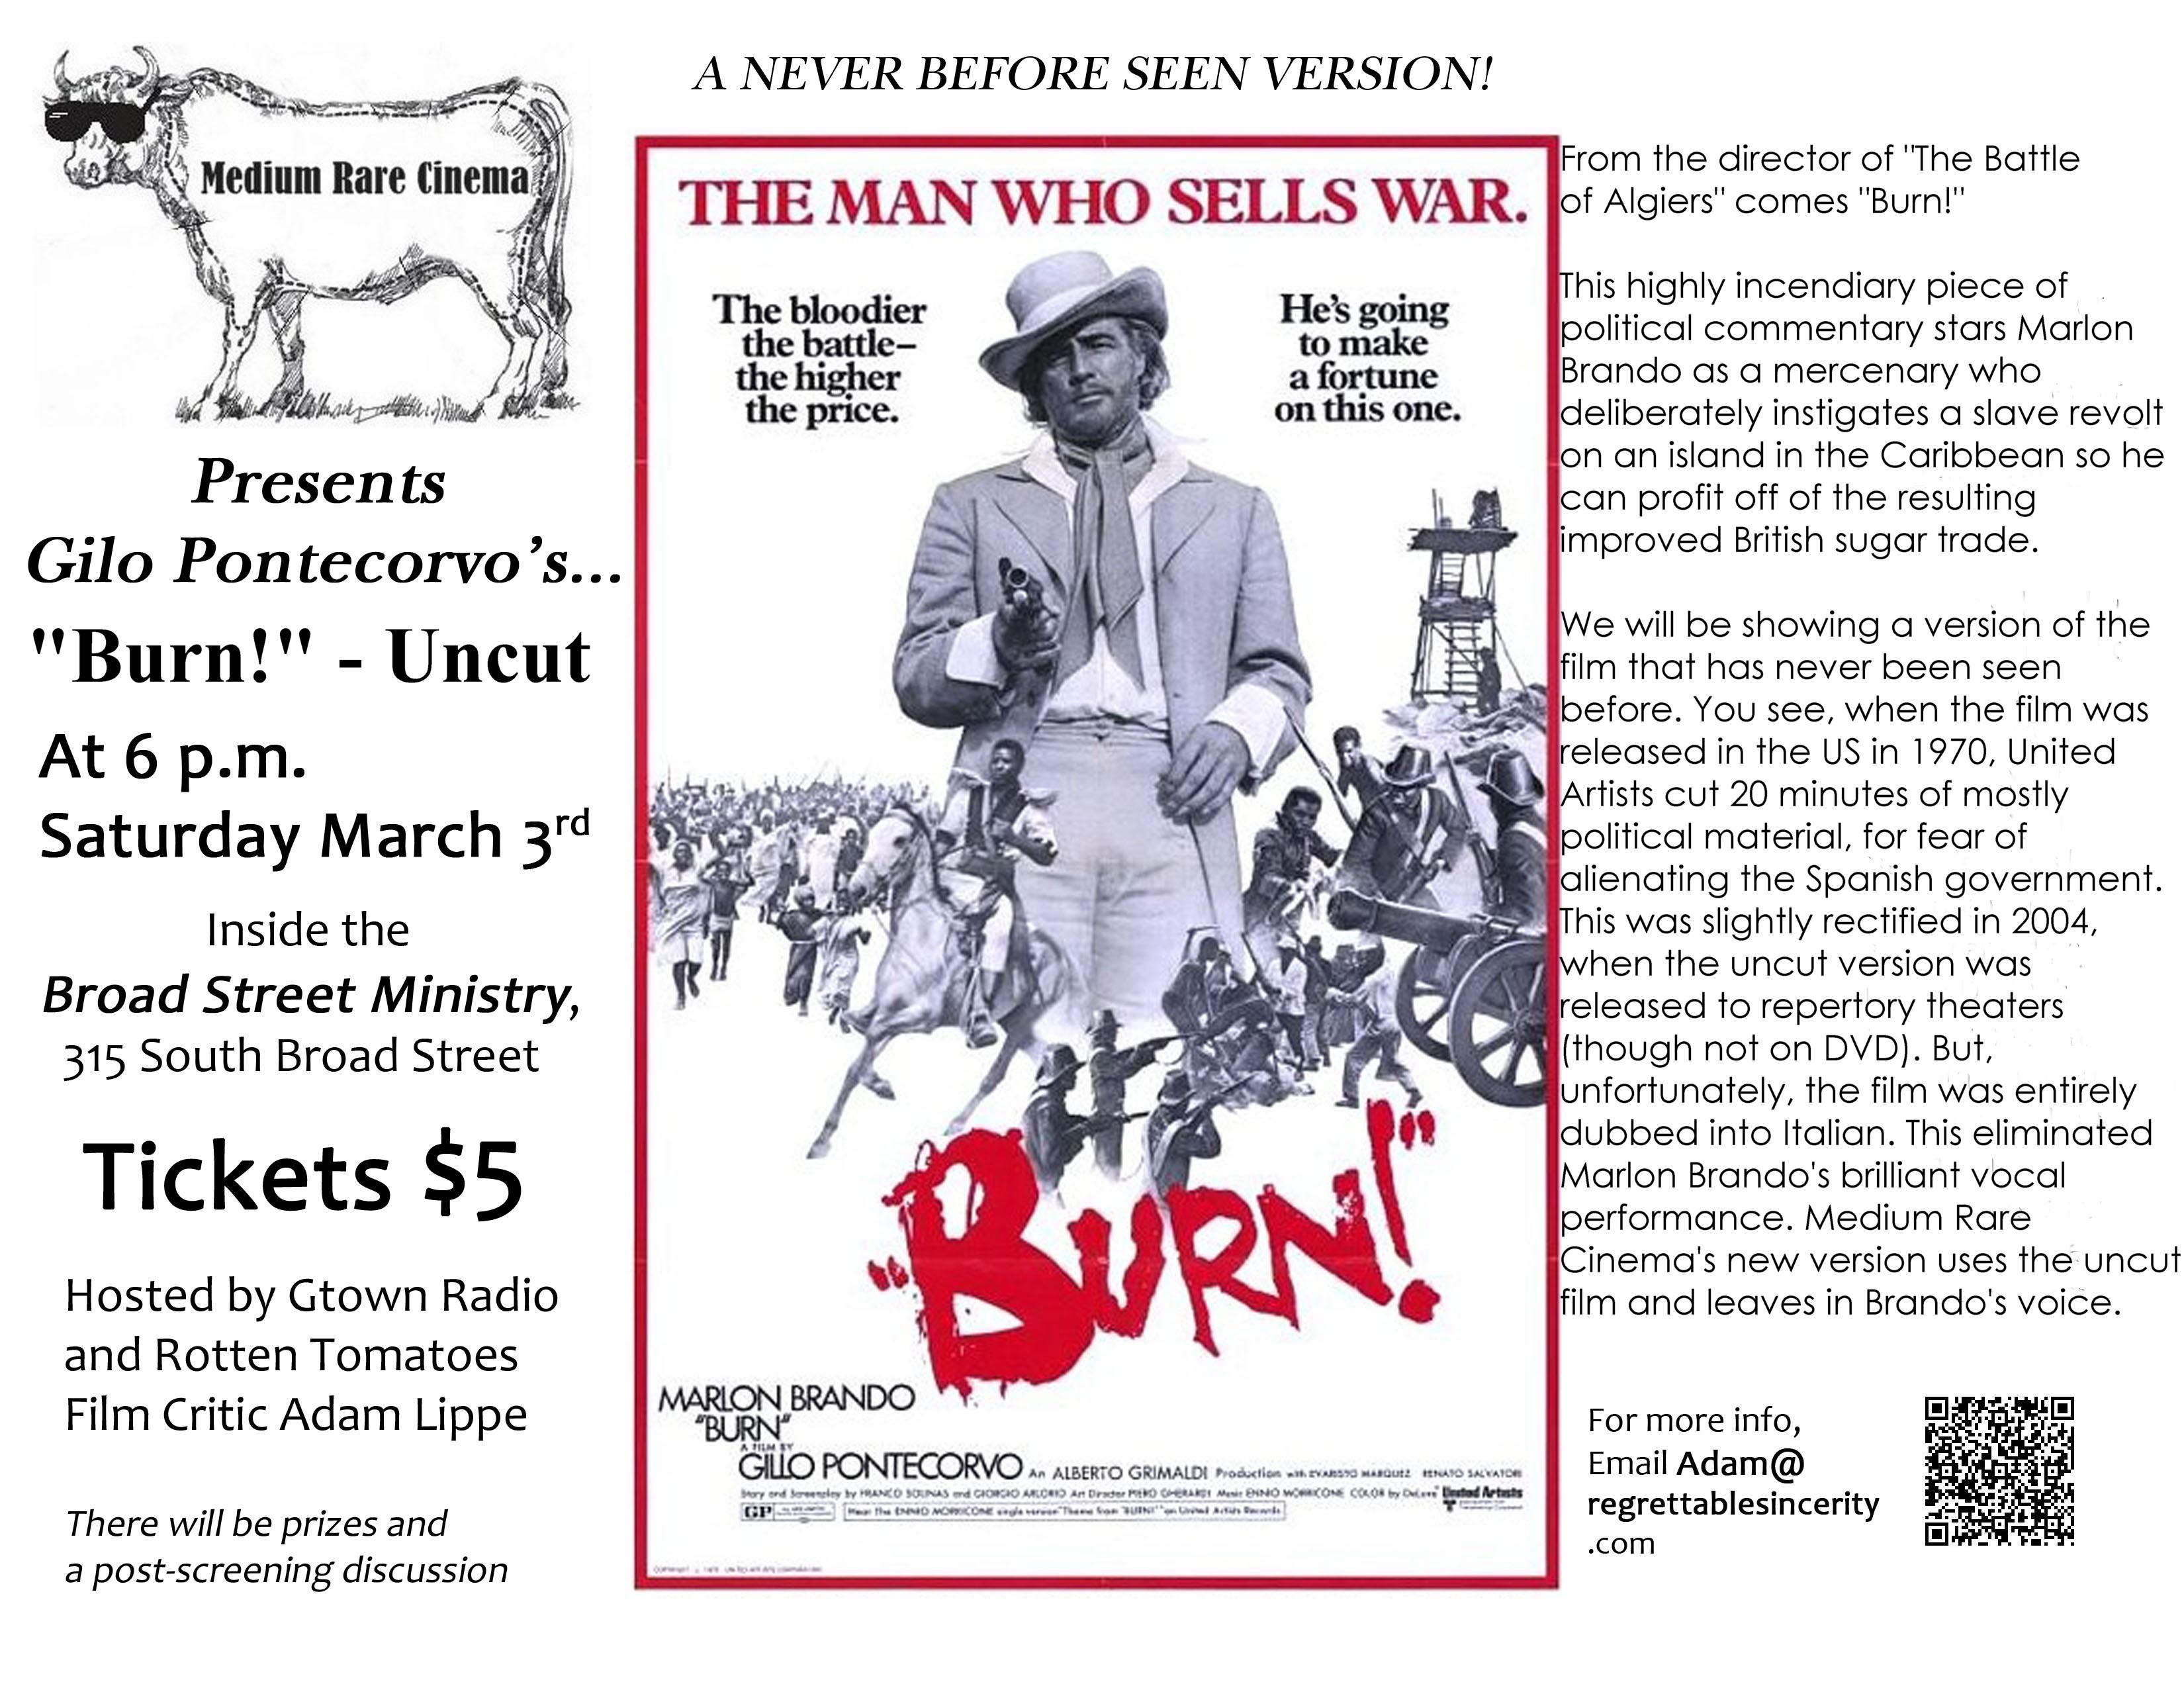 burn 1969 cast